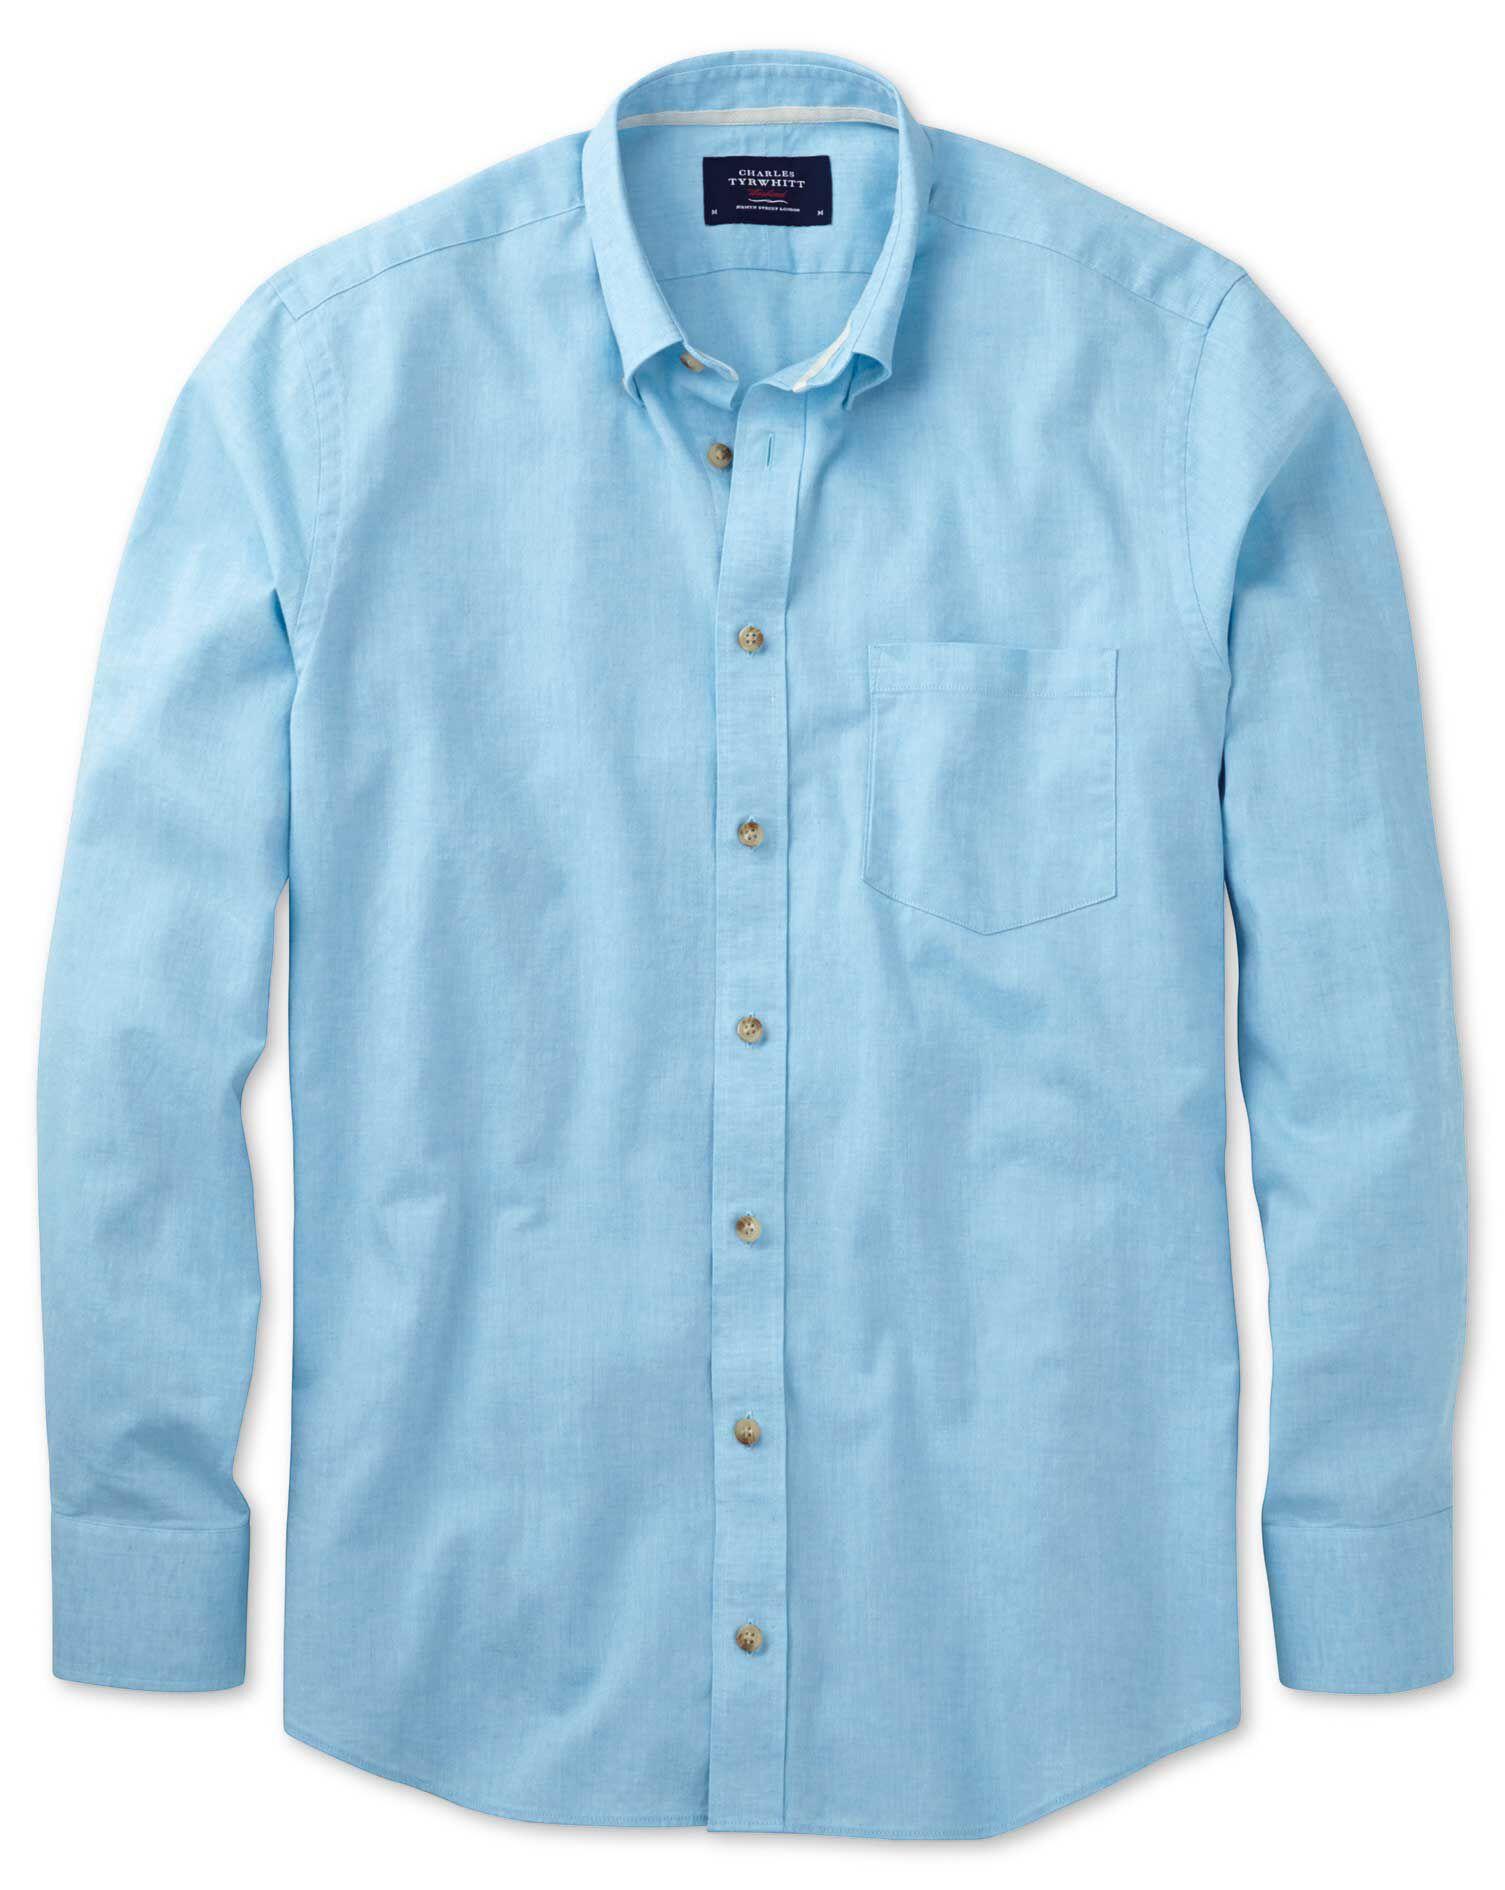 Classic Fit Aqua Blue Cotton Shirt Single Cuff Size Medium by Charles Tyrwhitt